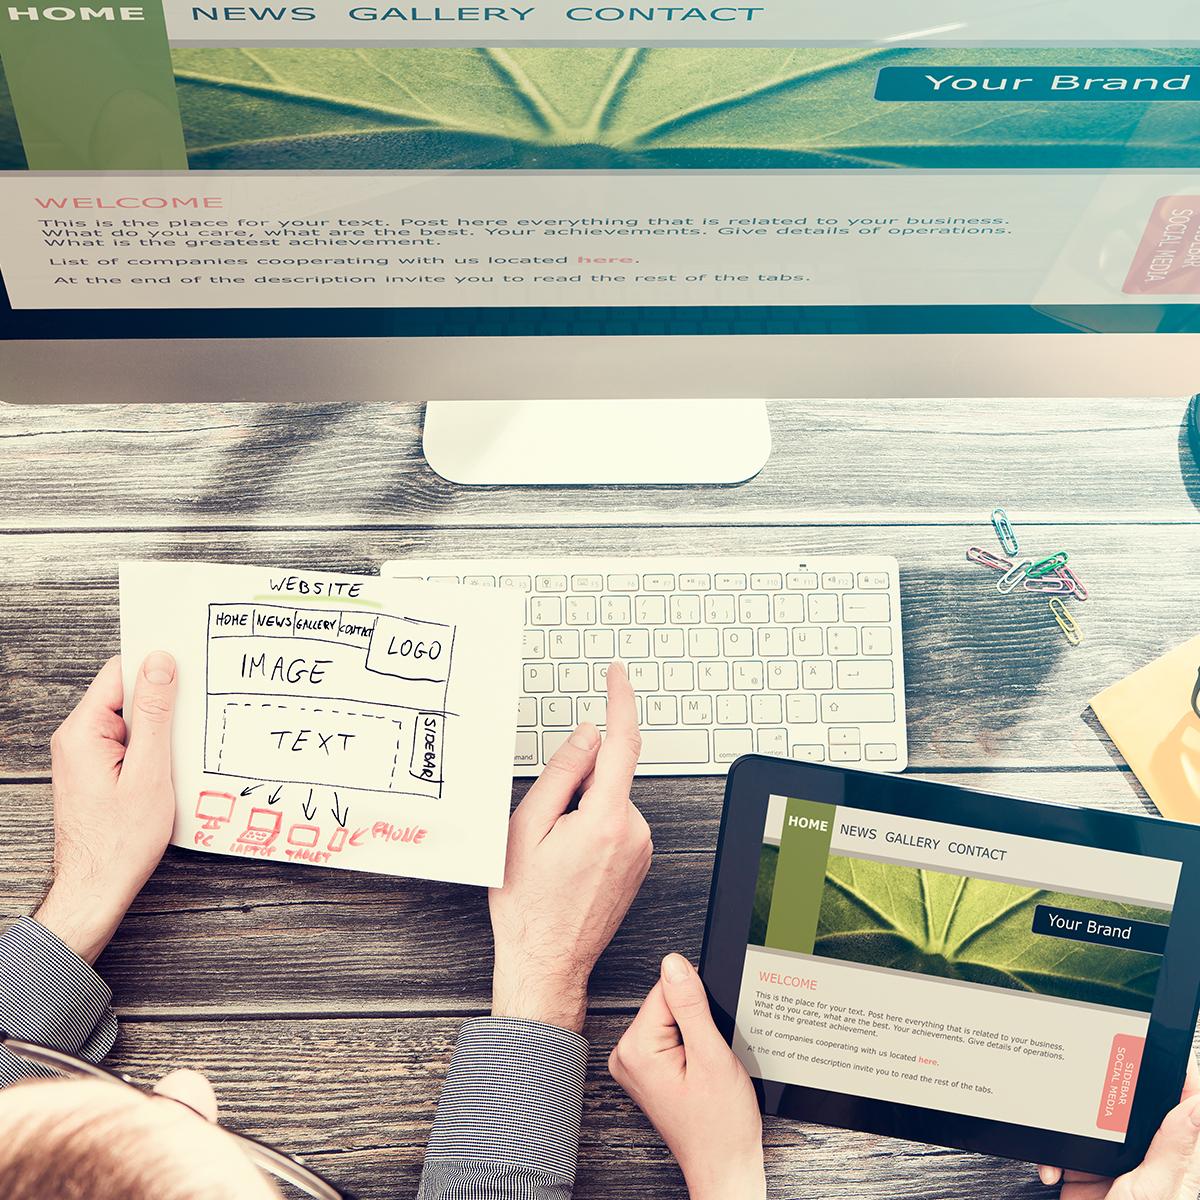 customer-communication-image1-1200x1200